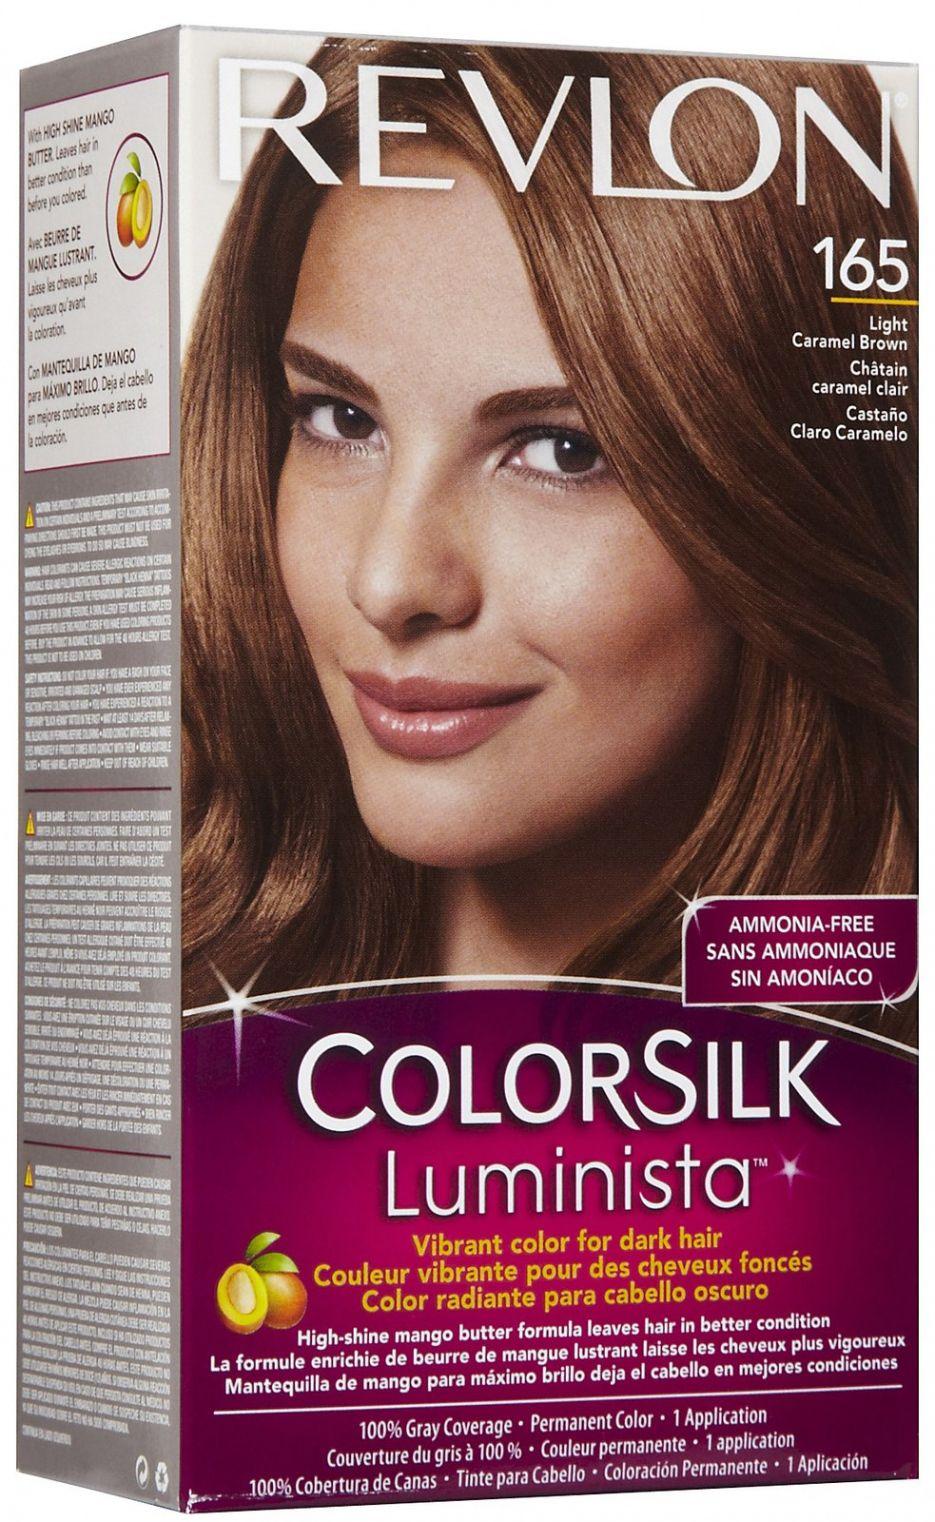 Revlon Colorsilk Hair Color 54 Light Golden Brown 1 Each Pack Of 9 Details Can Be Found B Revlon Colorsilk Hair Color Medium Hair Color Revlon Hair Color